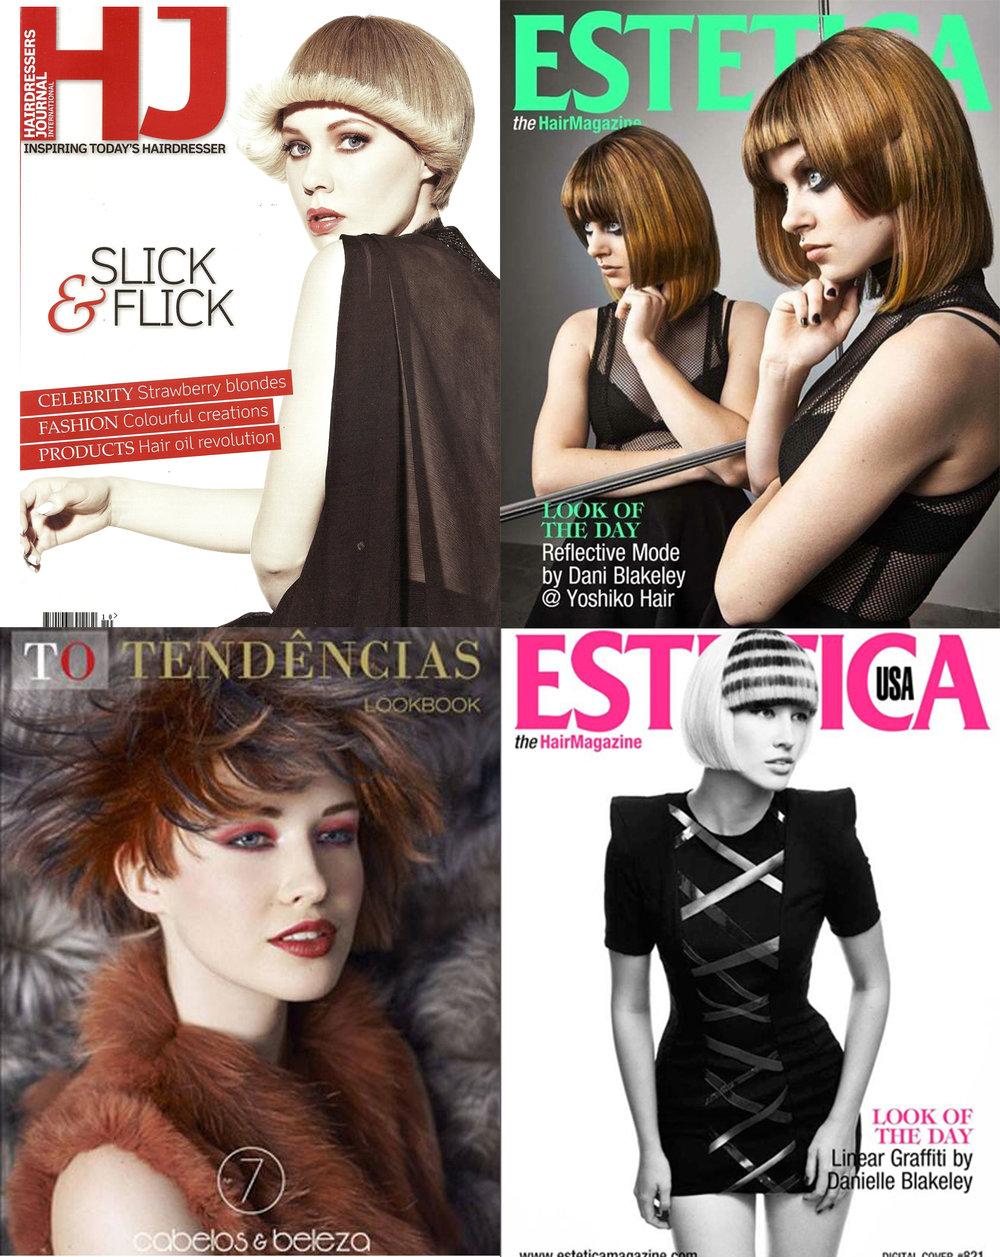 yoshiko hair_hairdresser_st kilda_ melbourneFront Covers Web.jpg